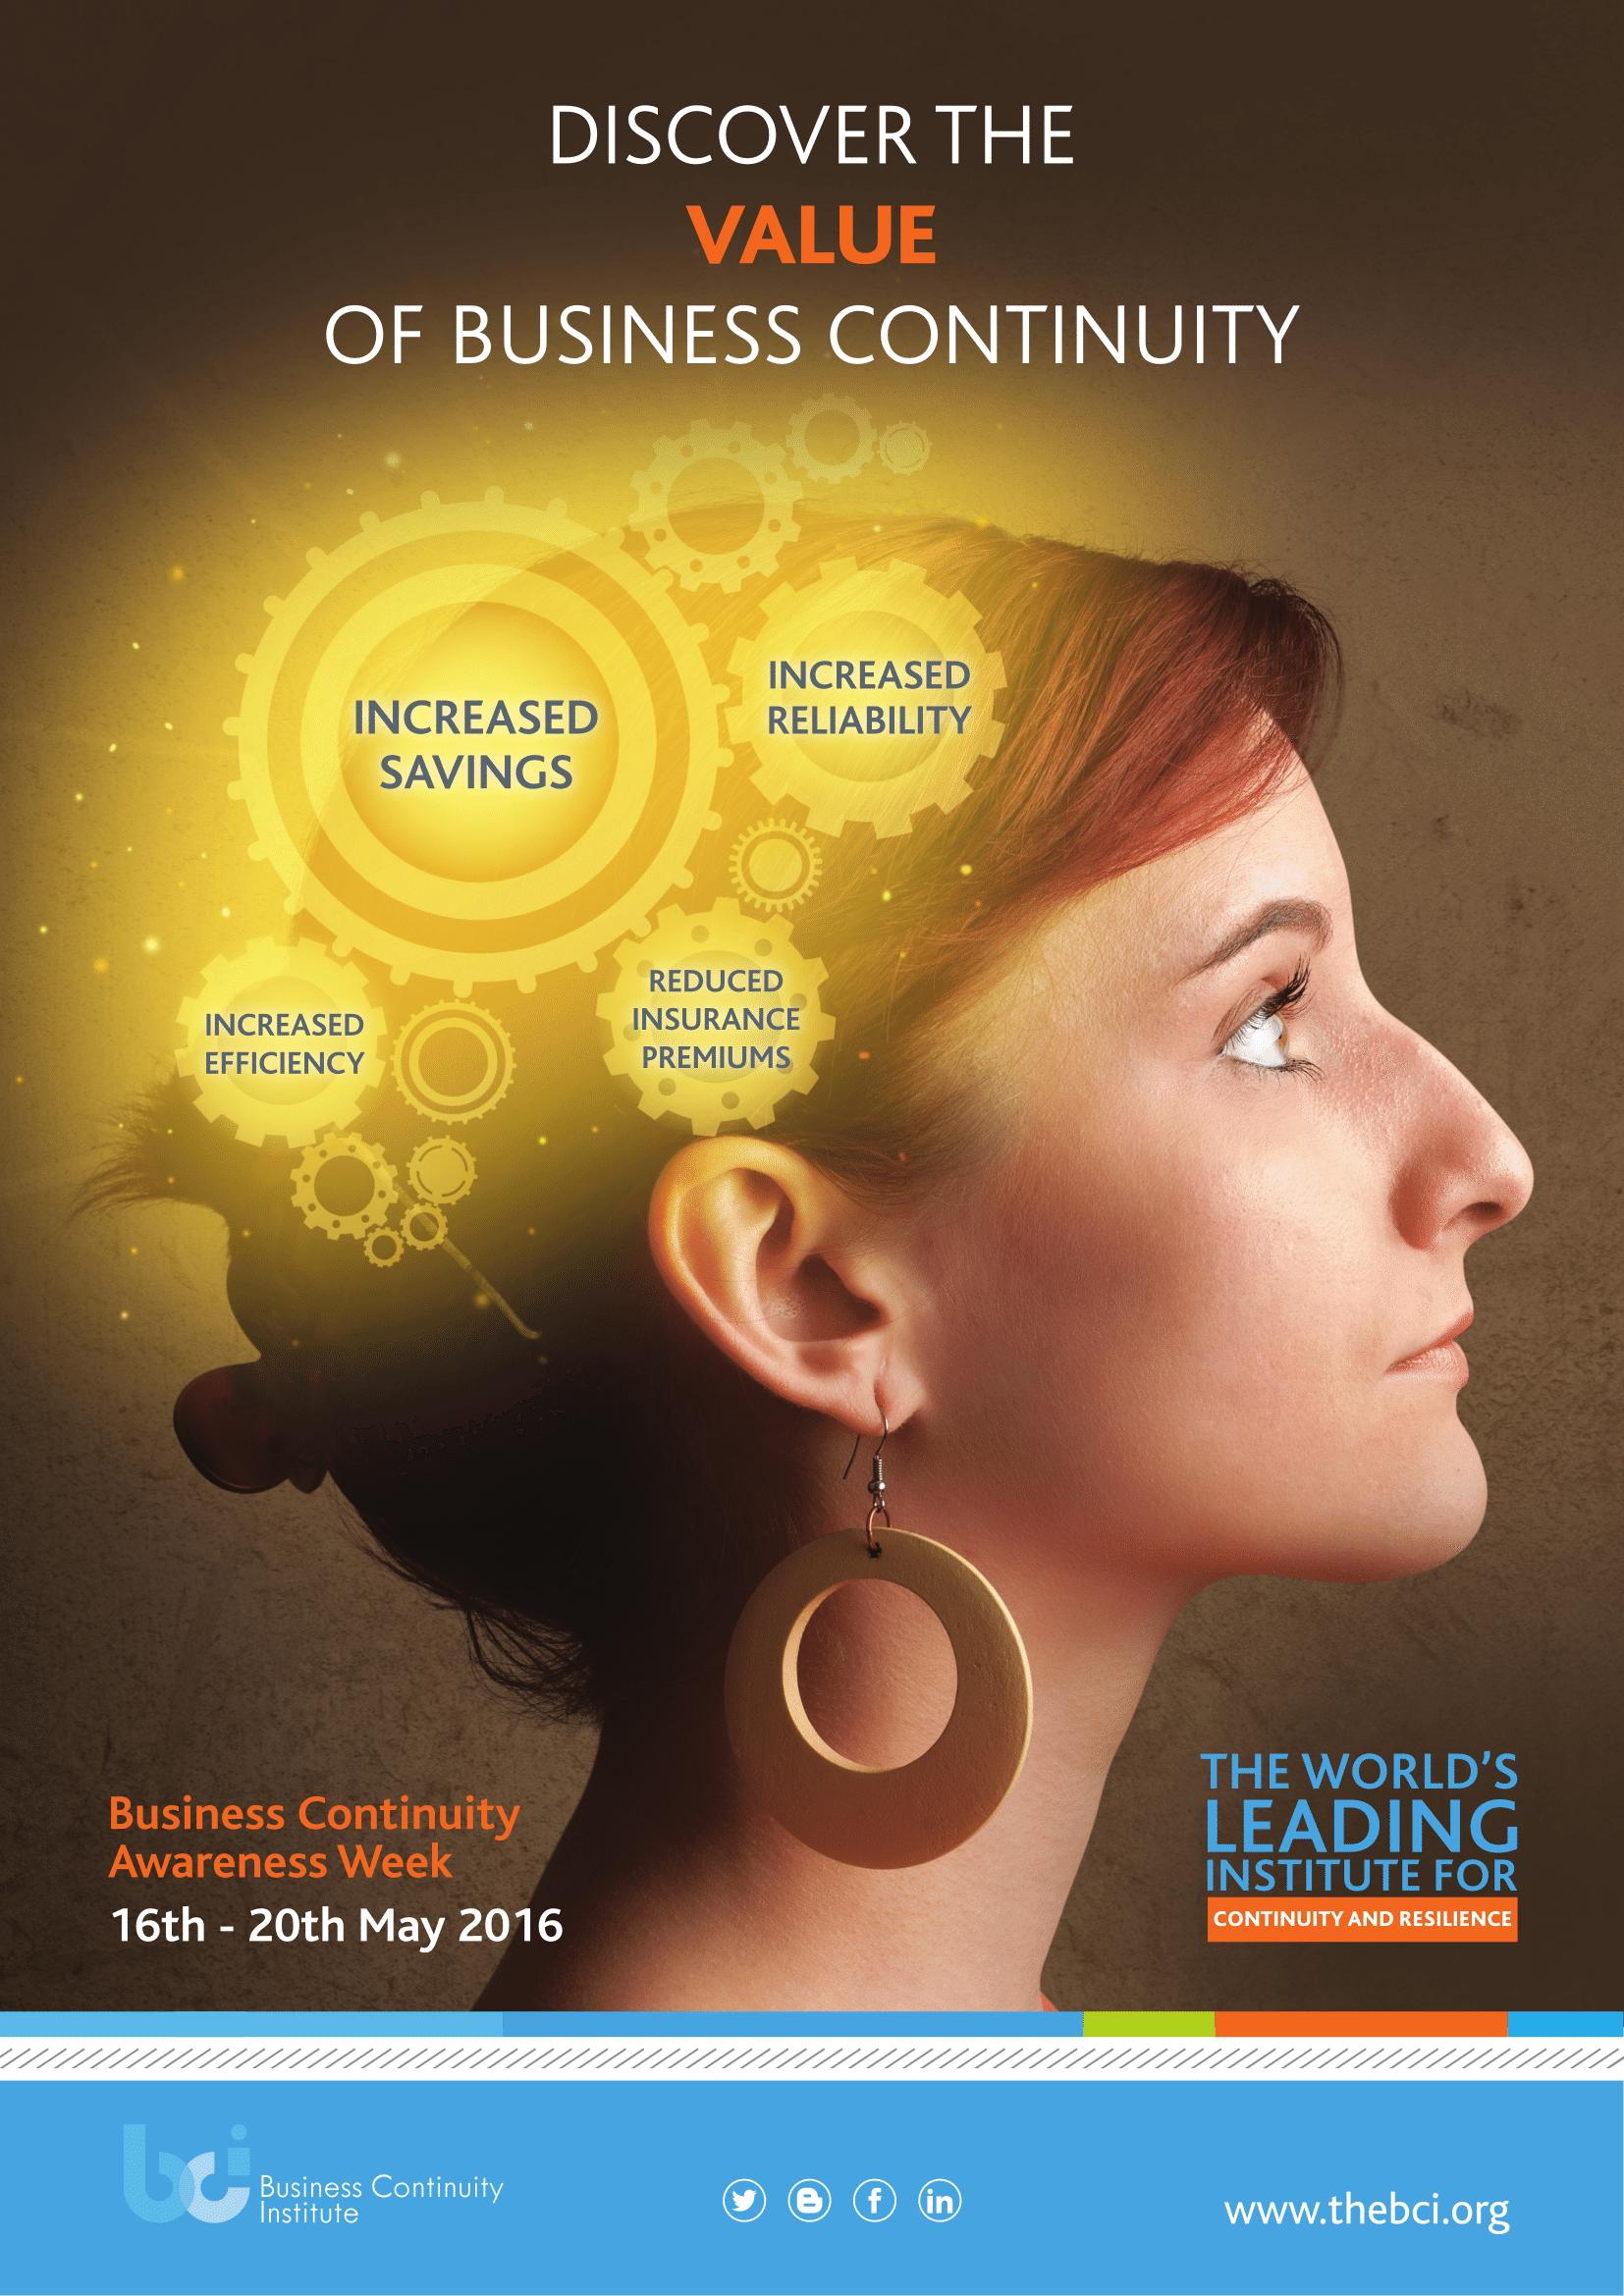 Business Continuity Awareness Week 2